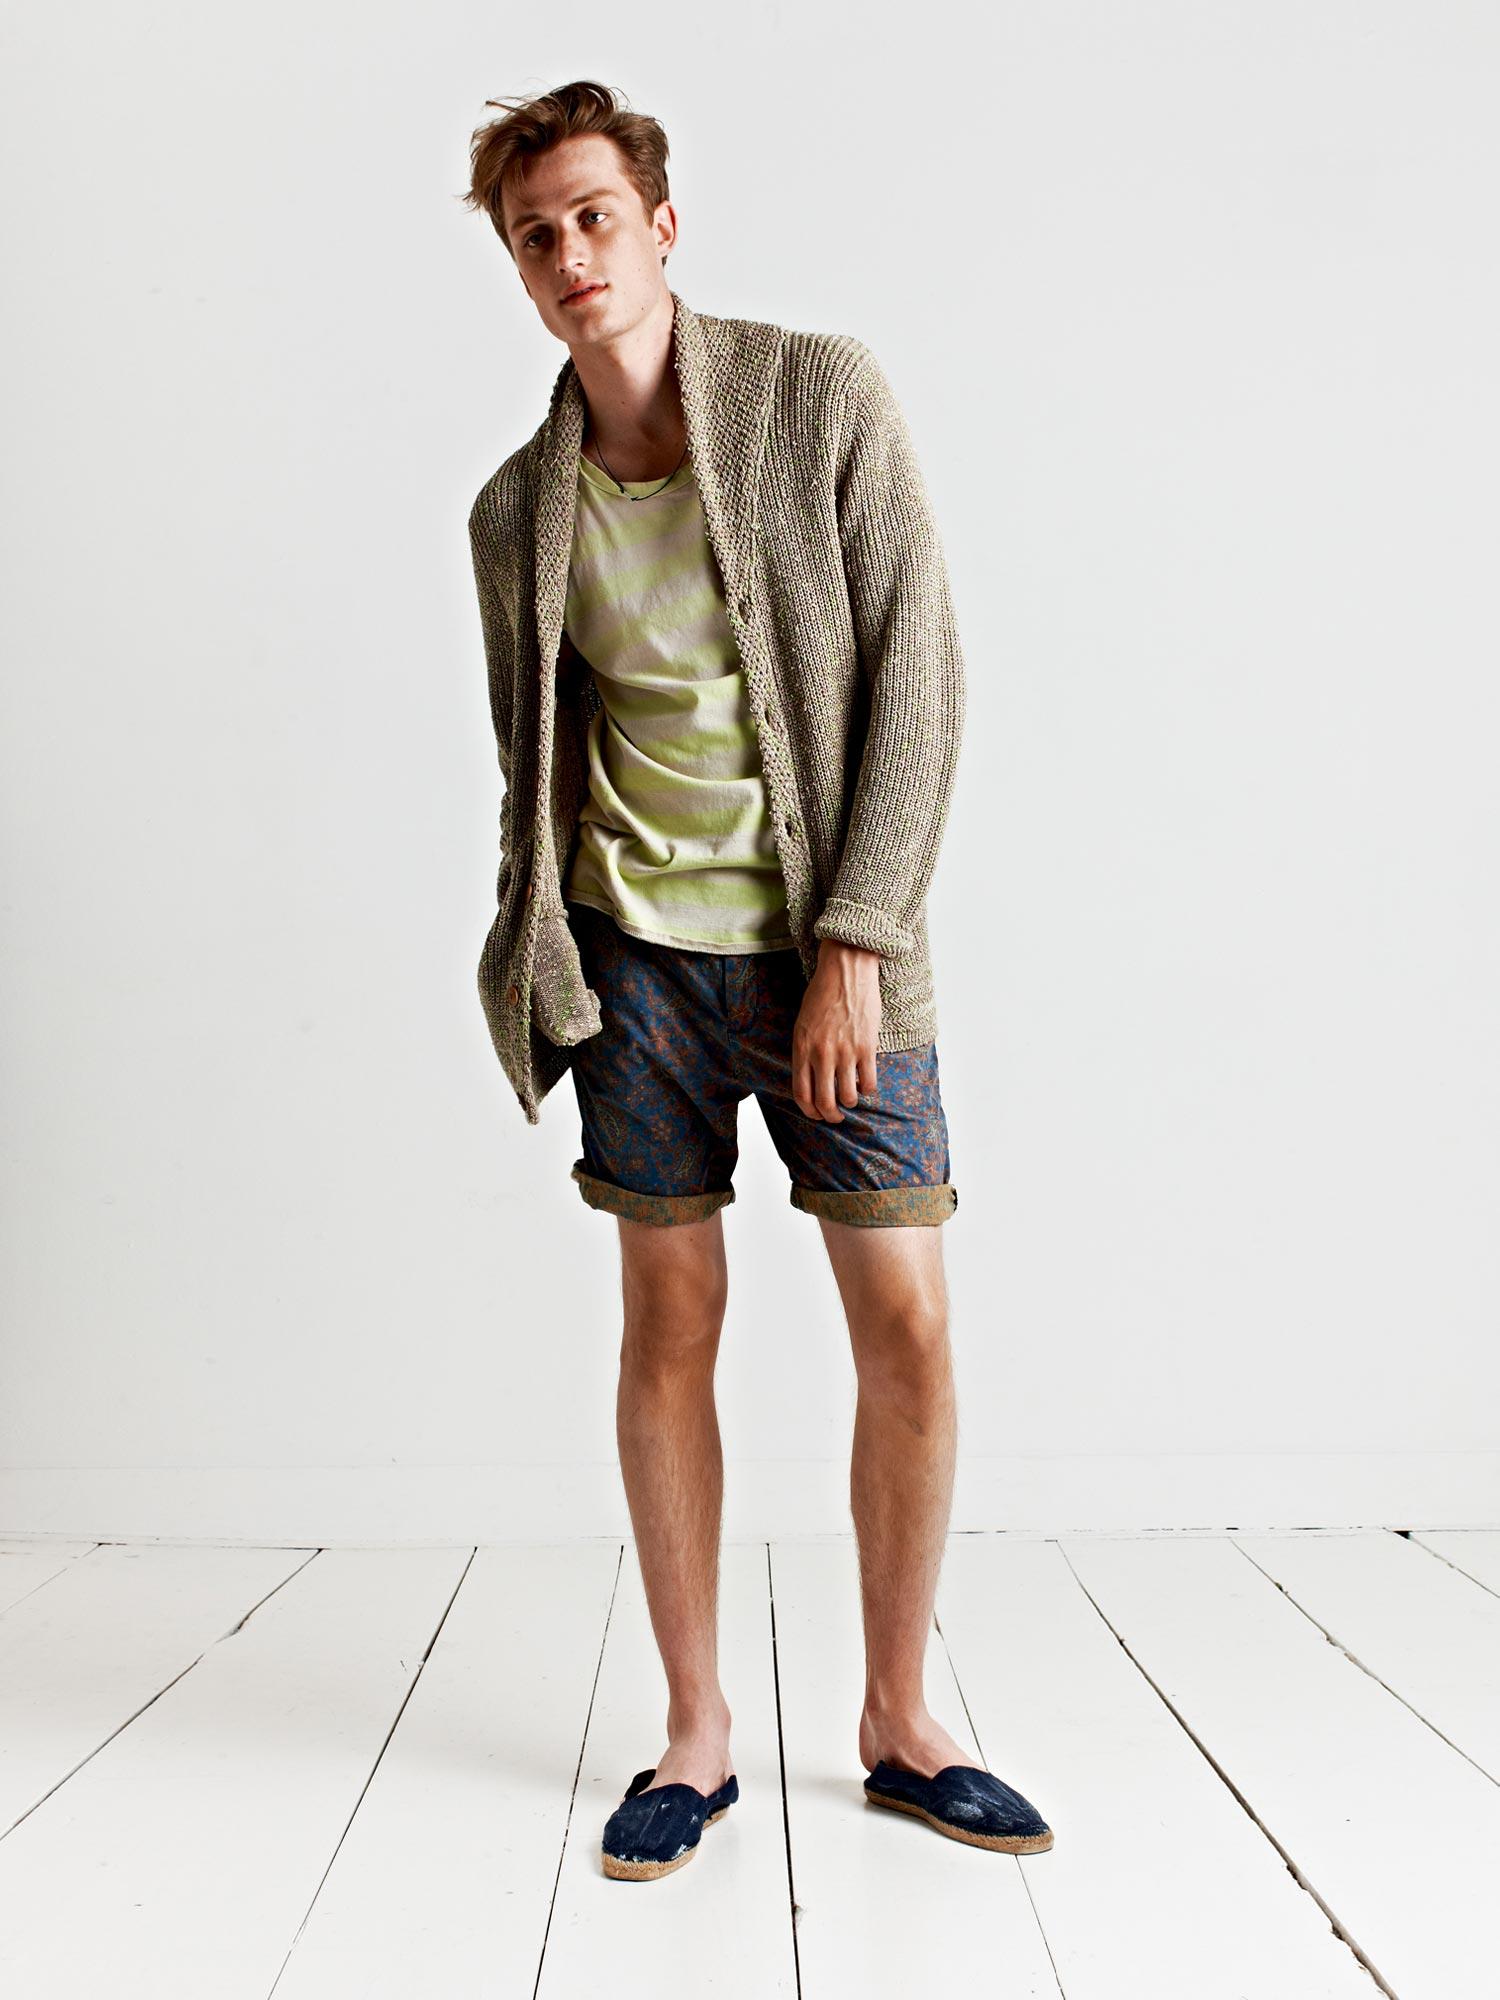 Hipster Summer Outfit Men